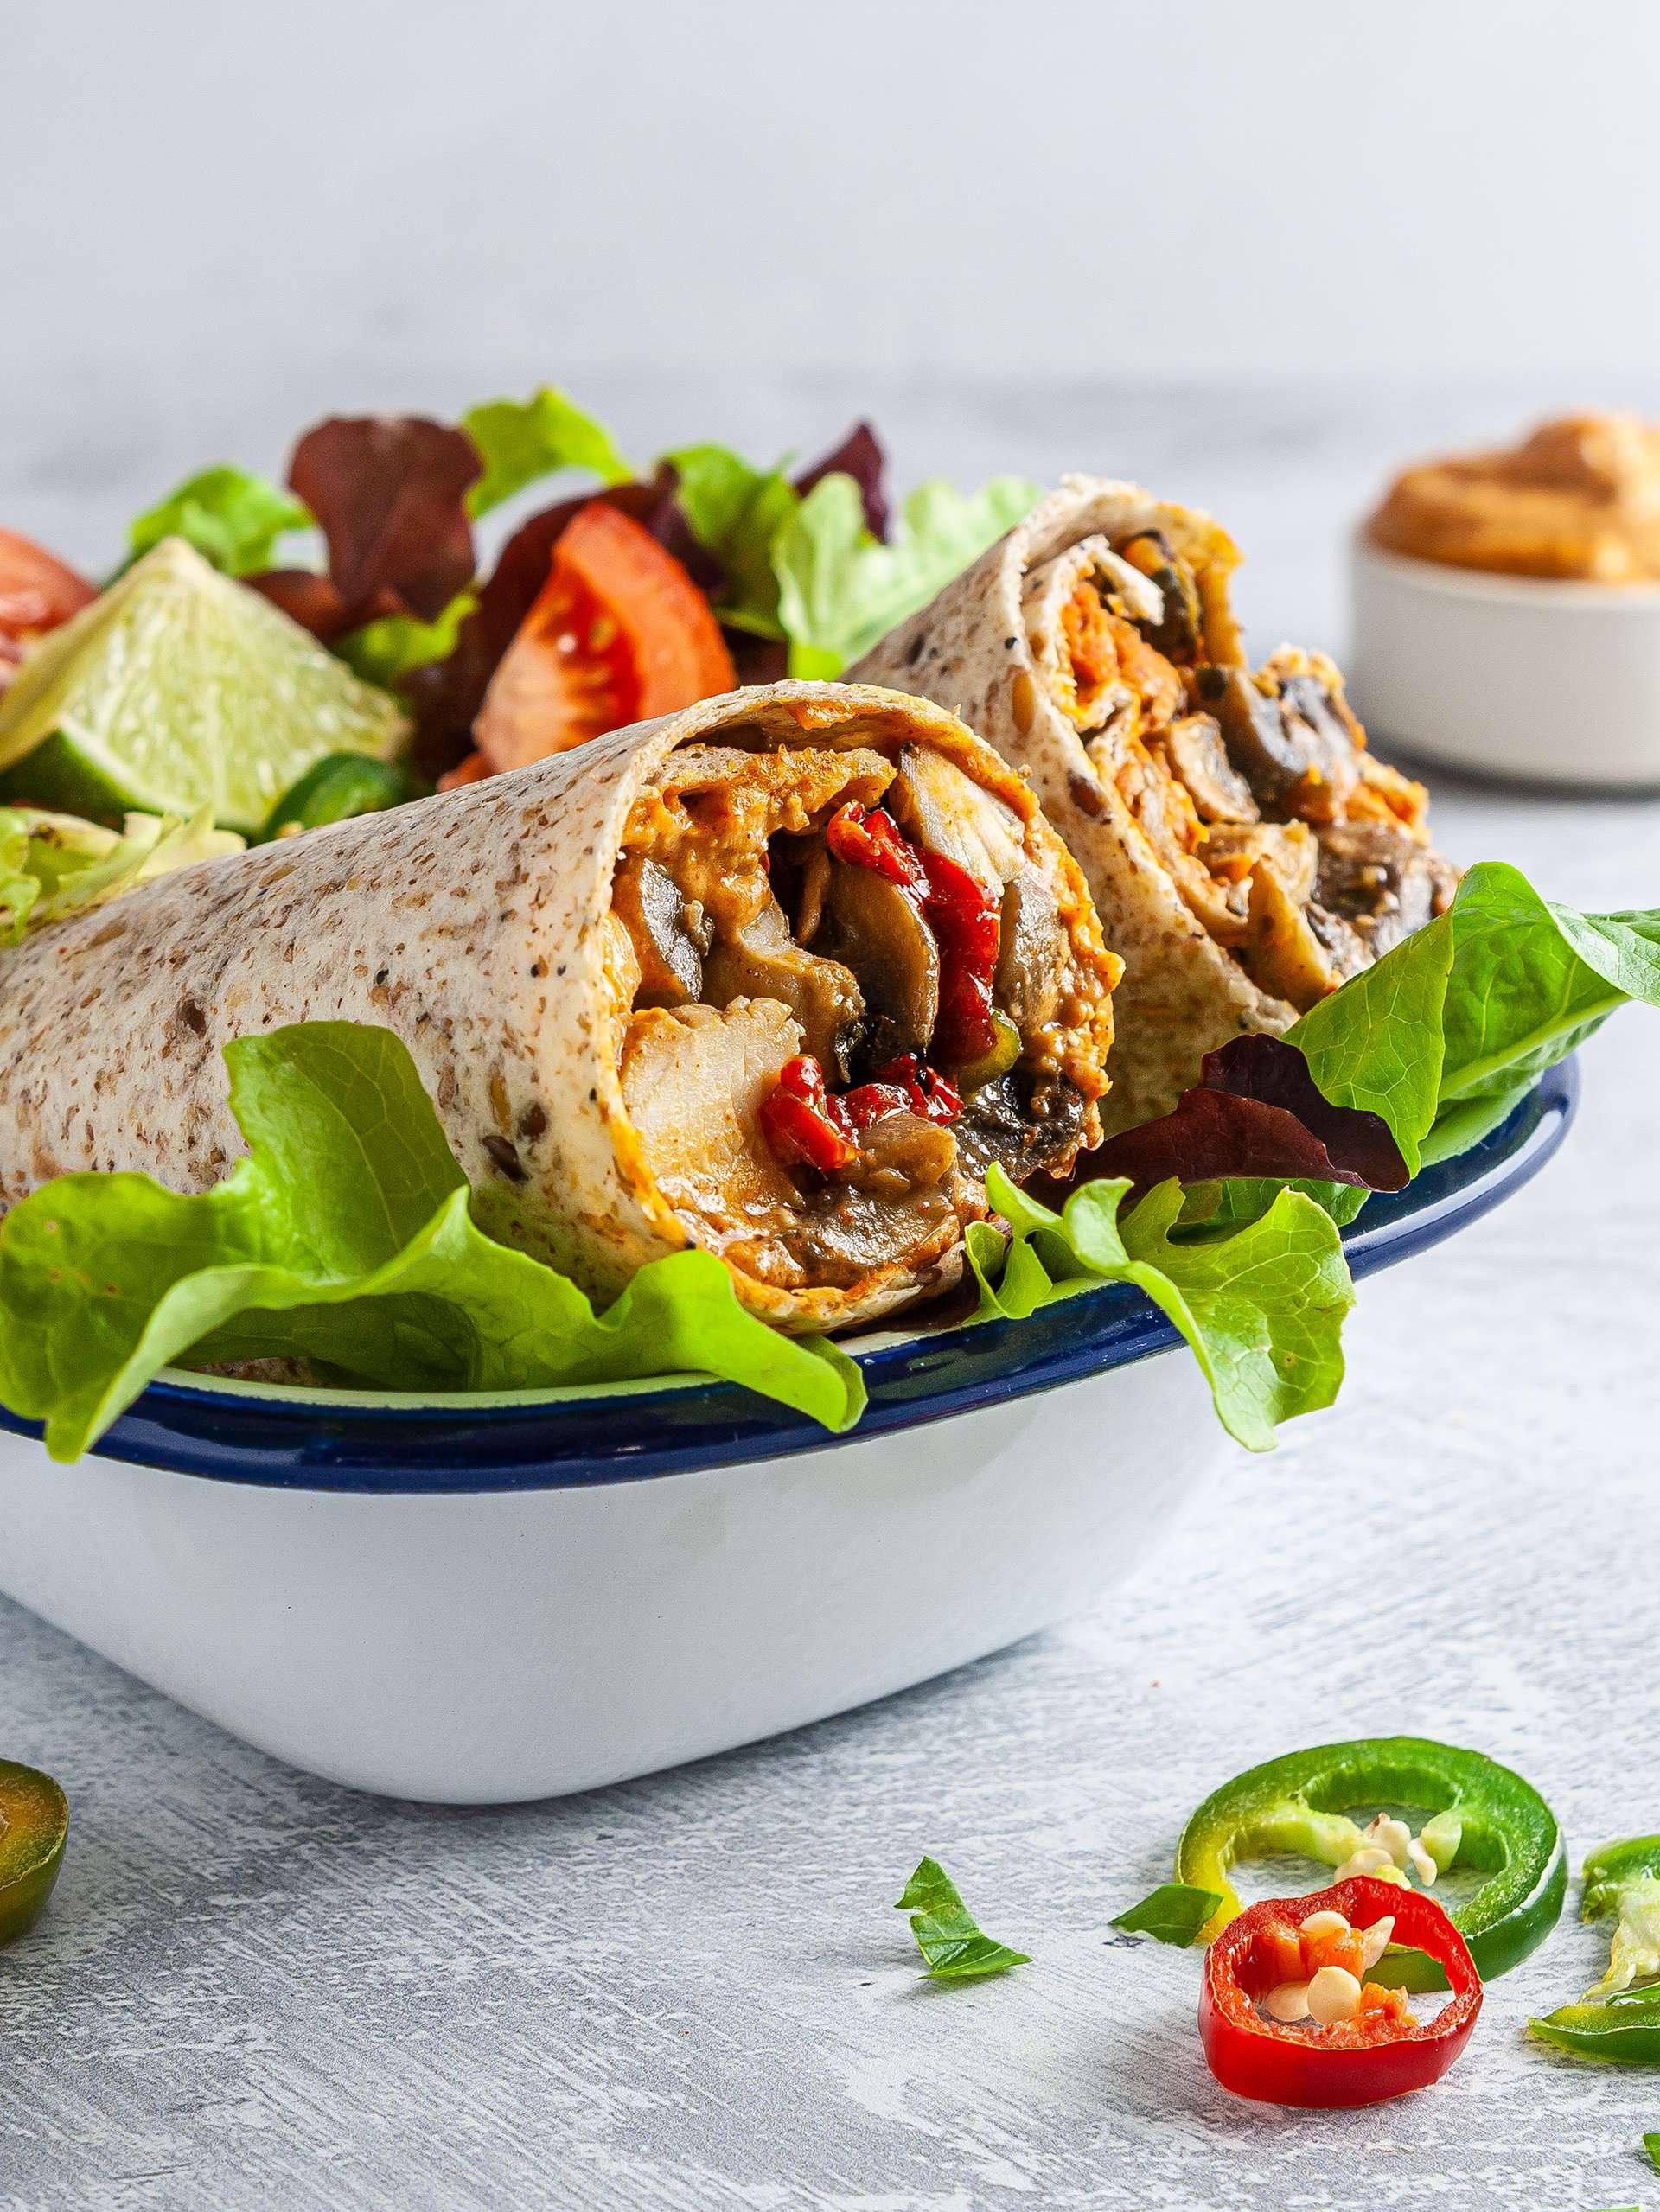 Spicy Chicken Mushroom Wrap Recipe Thumbnail